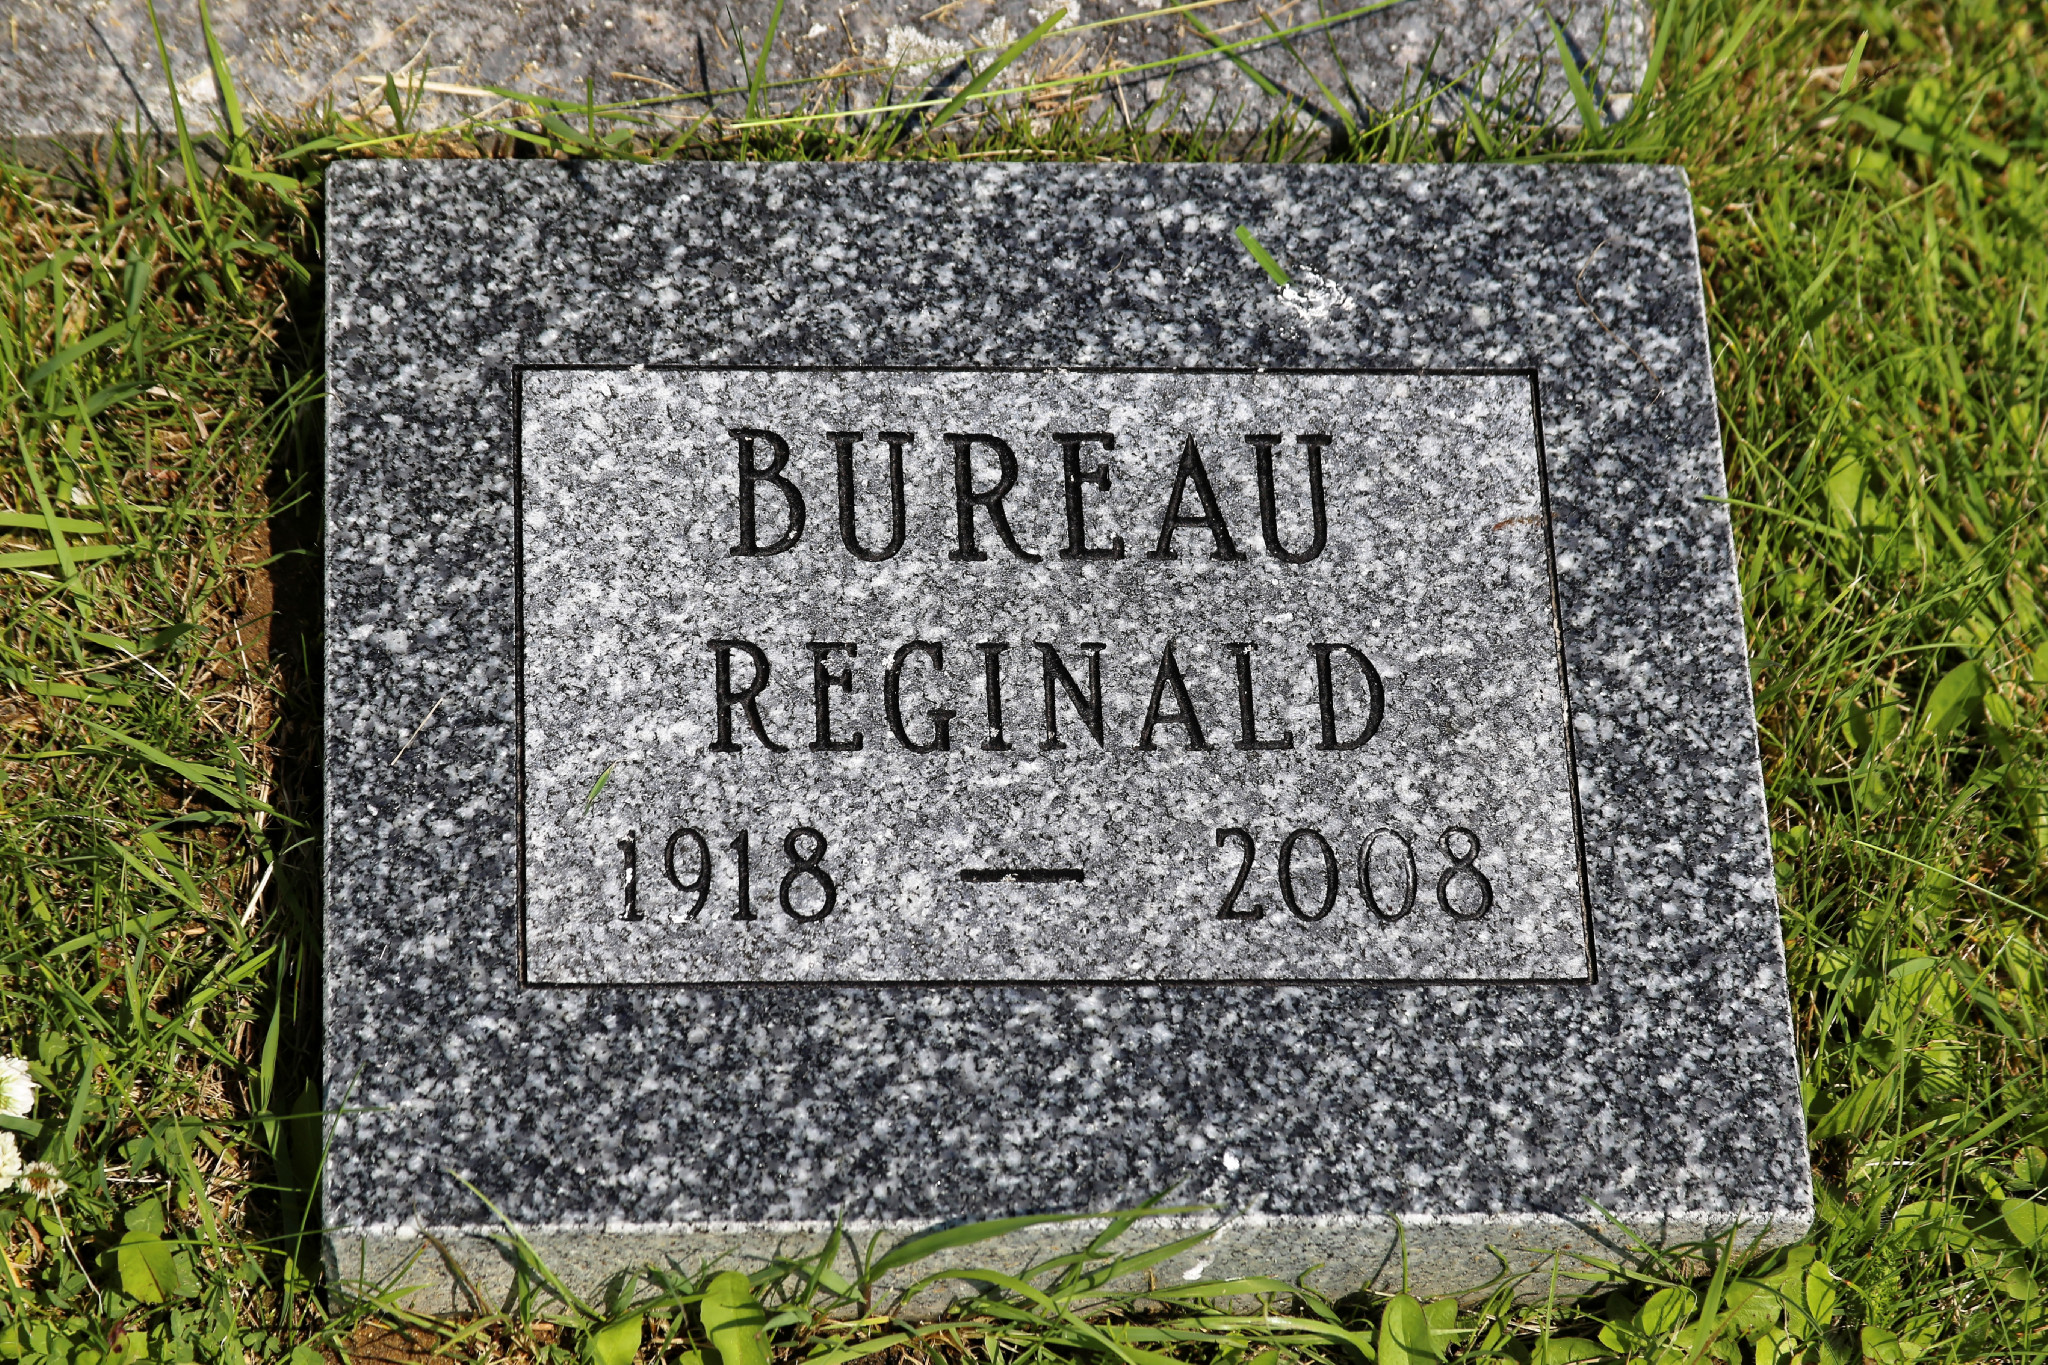 Réginald Bureau